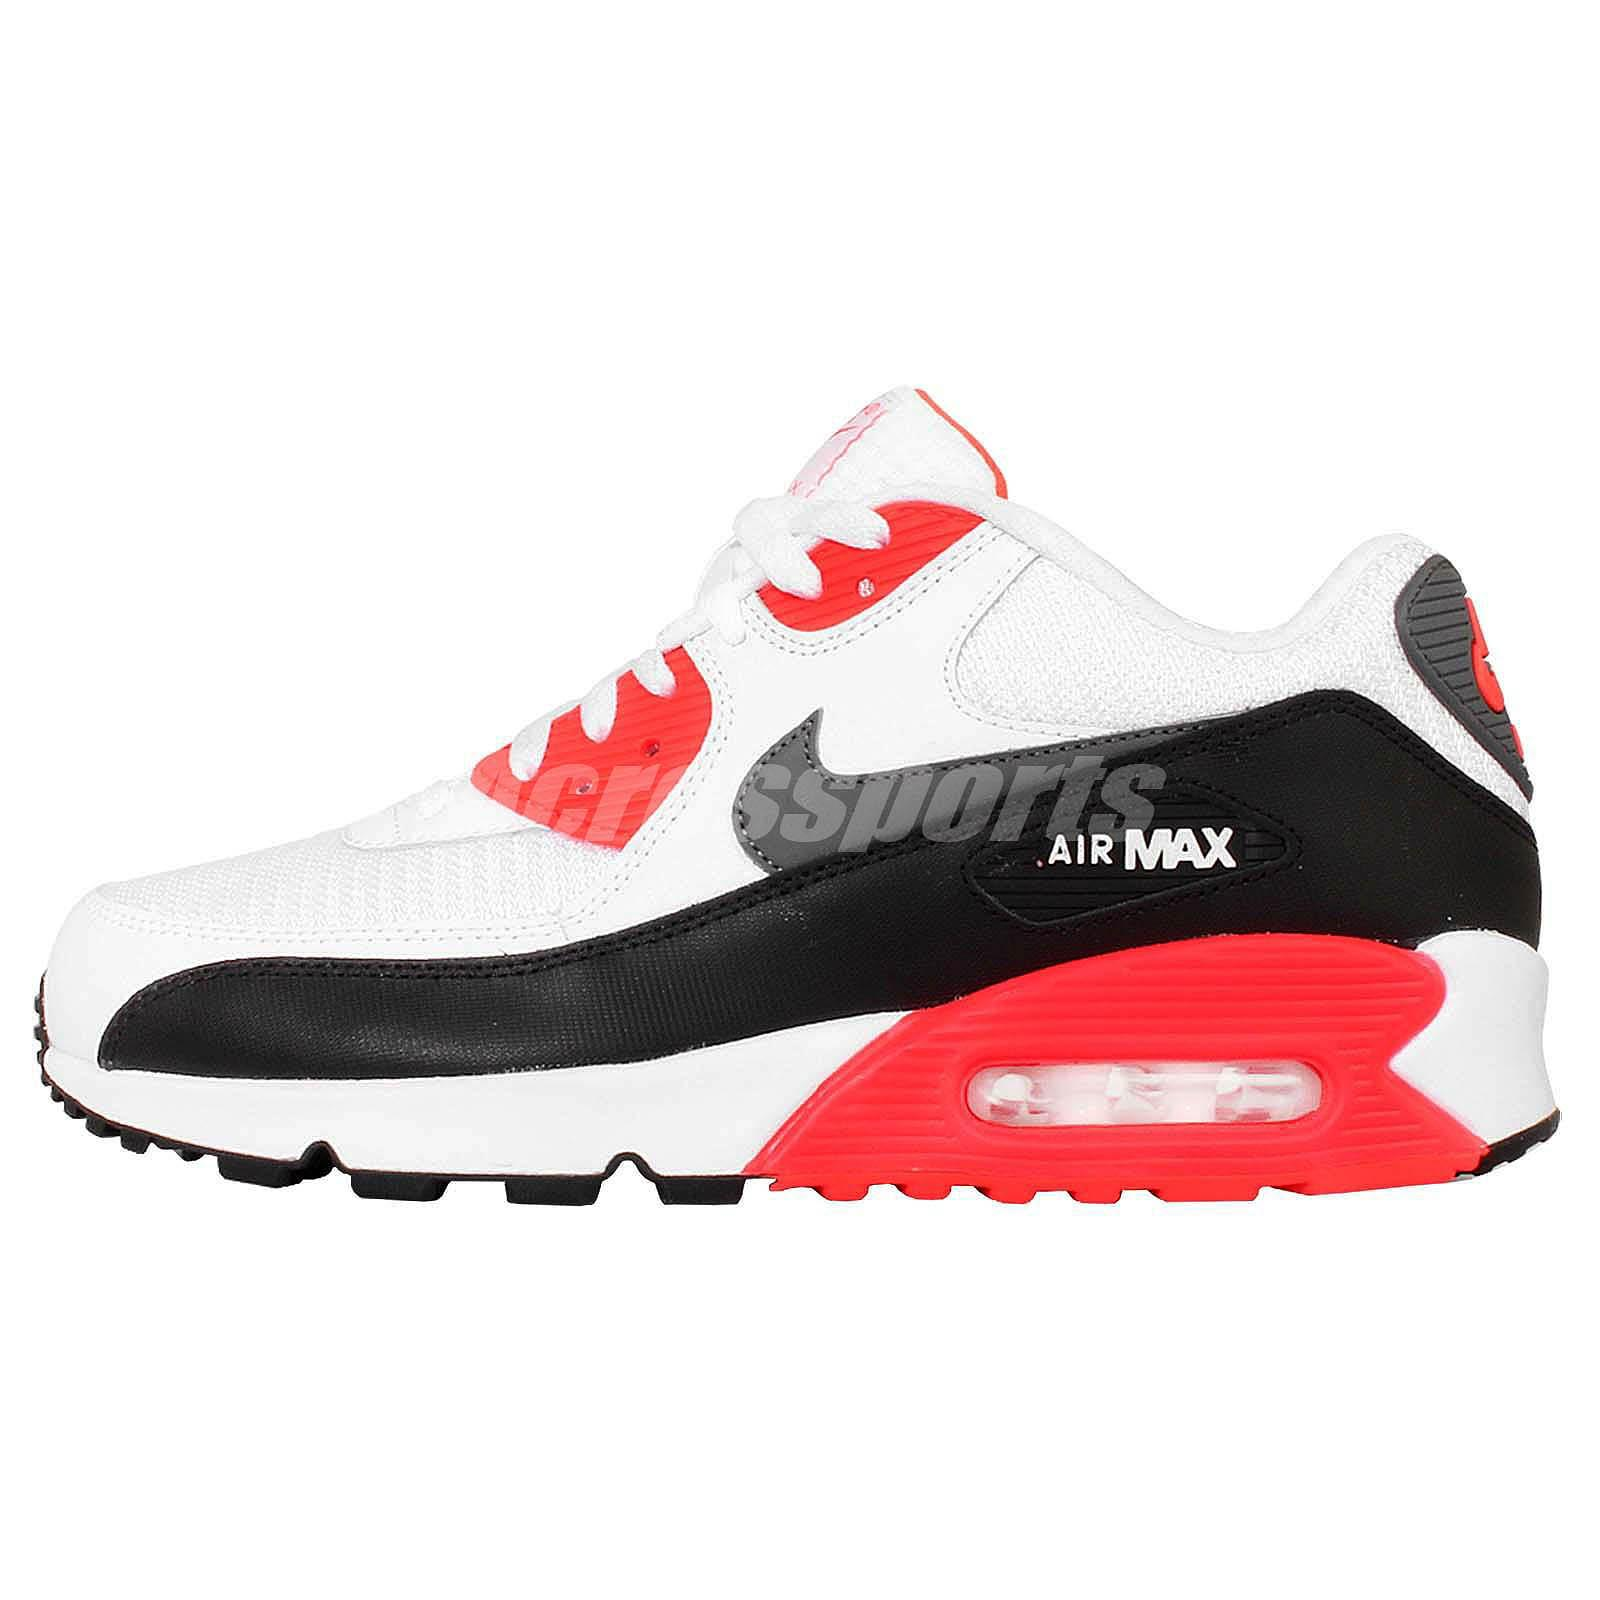 Nike Air Max 90 Essential White Infrared Black Mens Running Shoes OG 537384-126